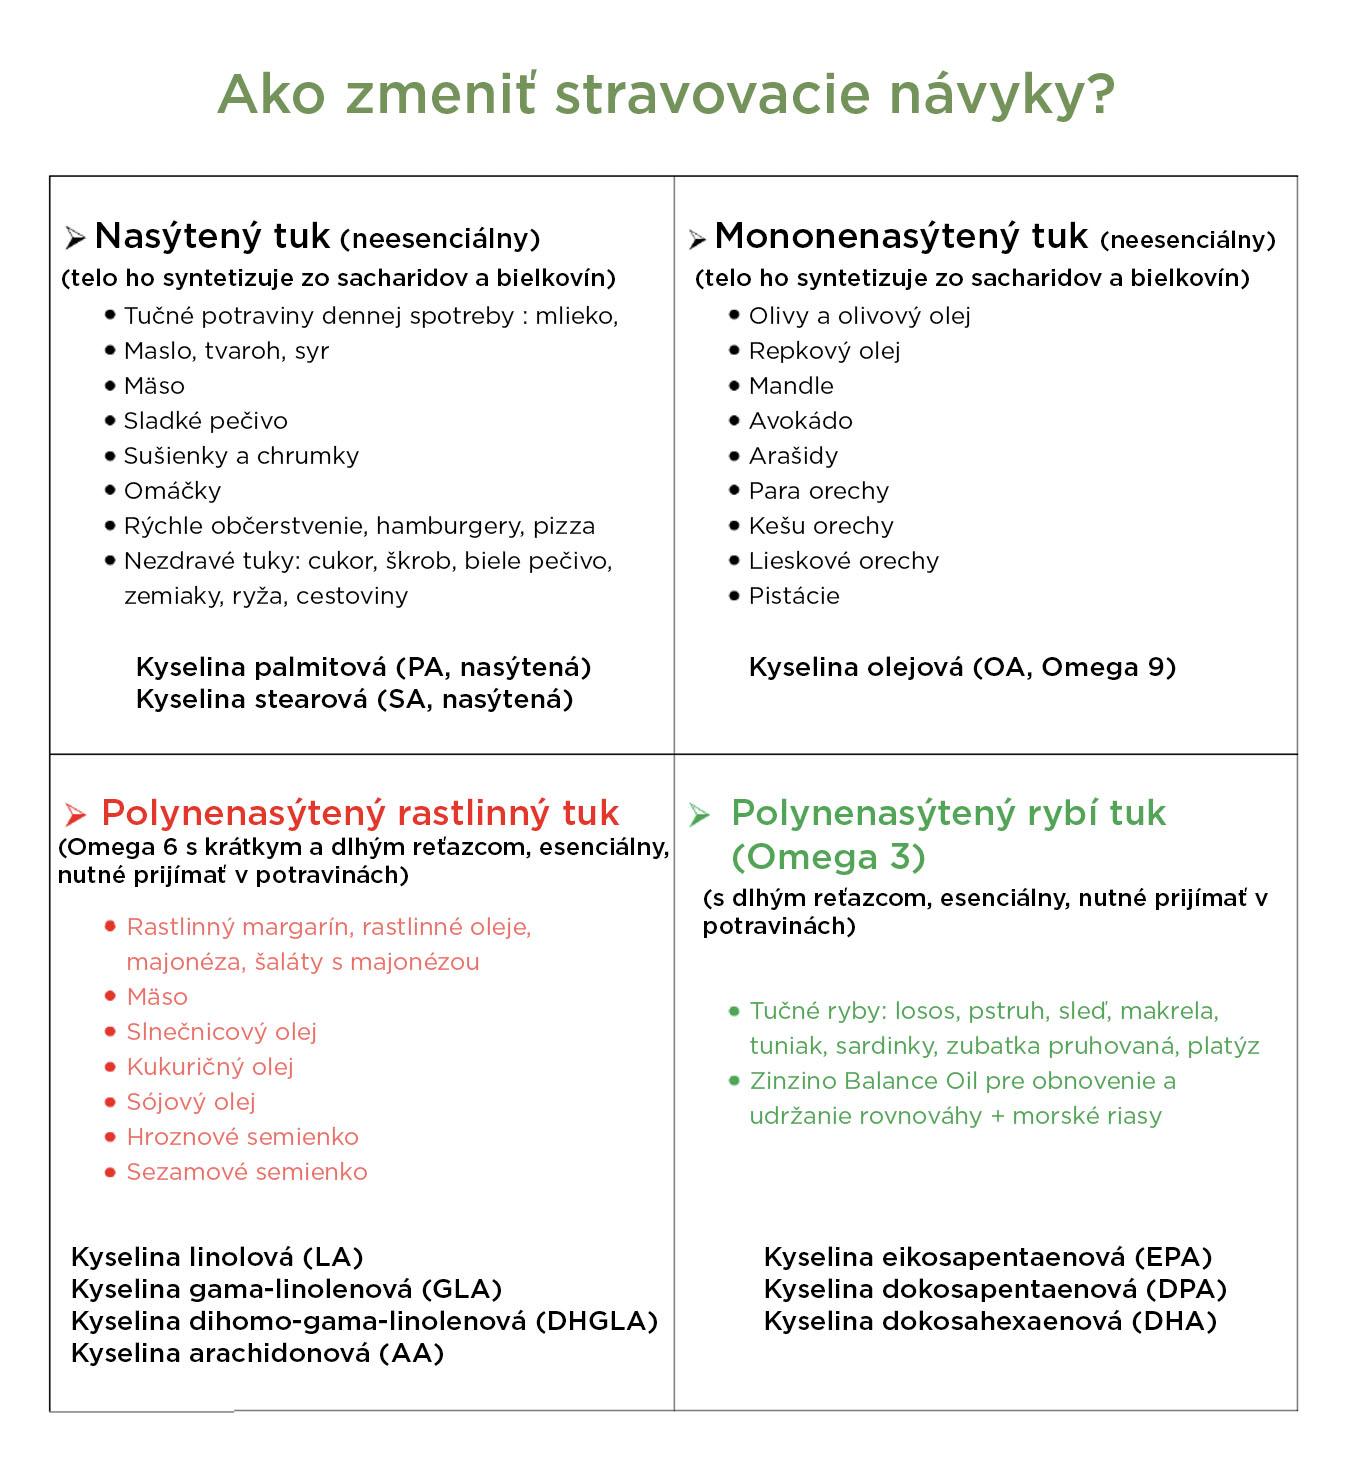 stravovaci-navyky-infografika-brainmarket-sk